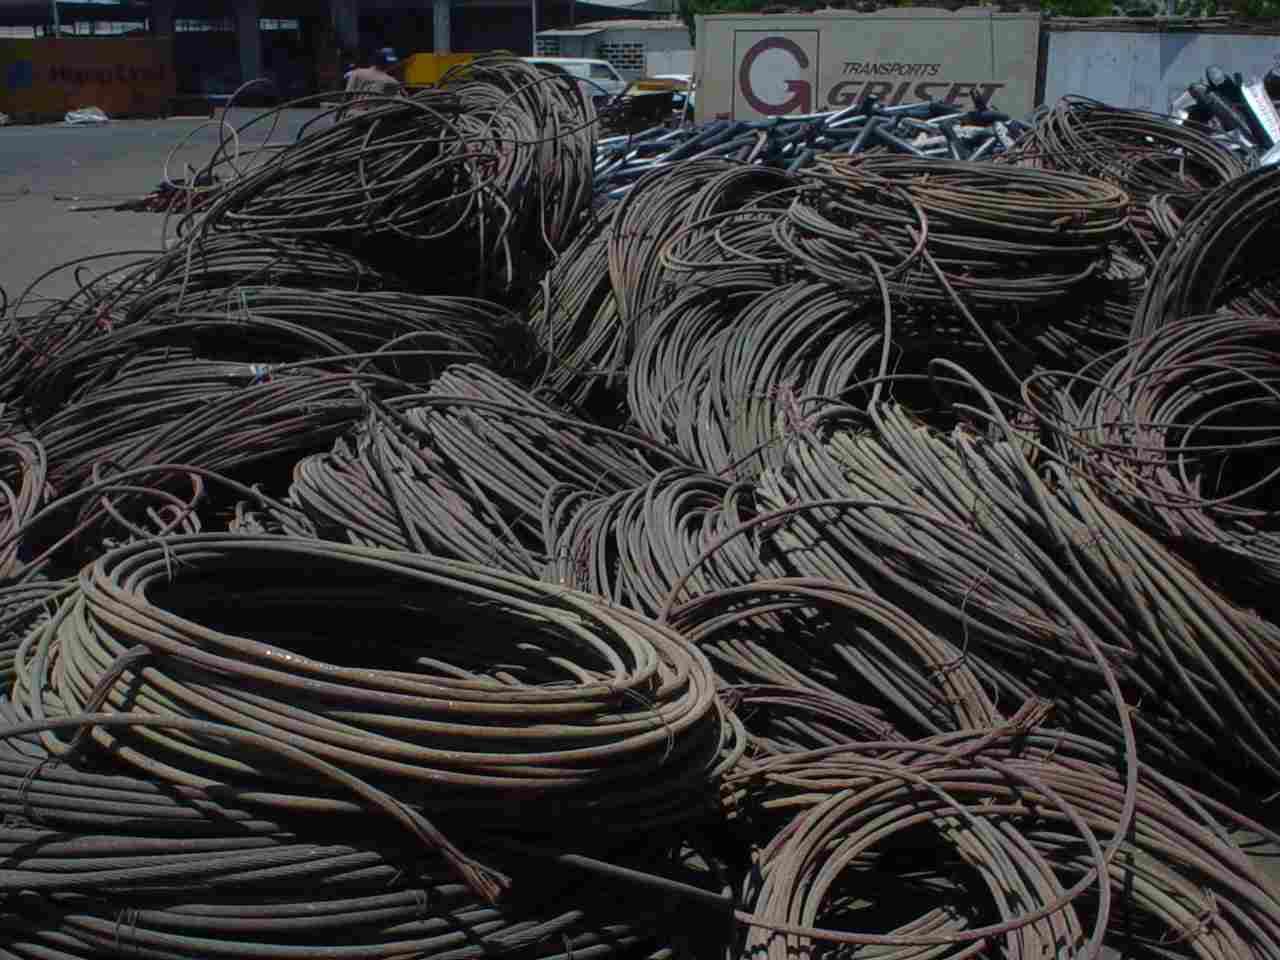 Scrap Copper Market Wholesale, Scrap Copper Suppliers - Alibaba